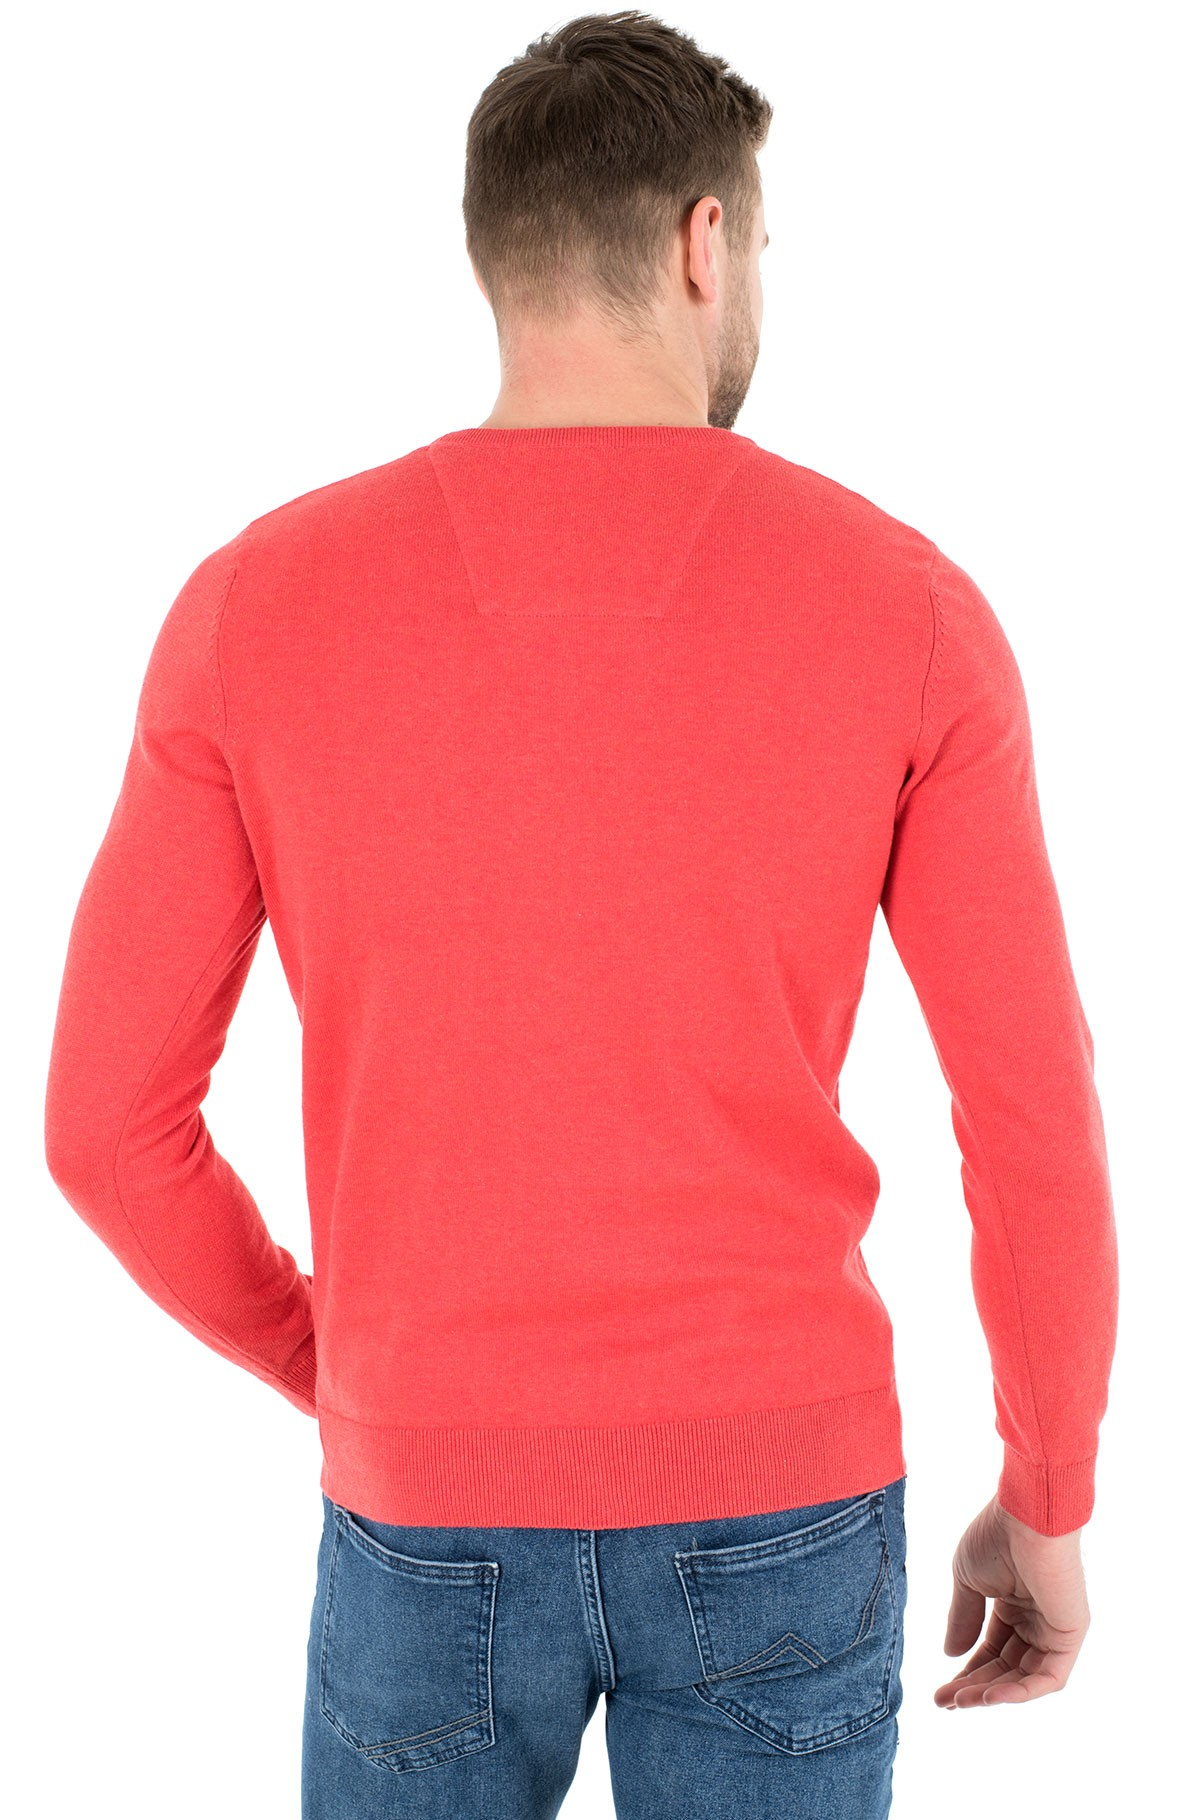 Sweater 1012819 -full-2